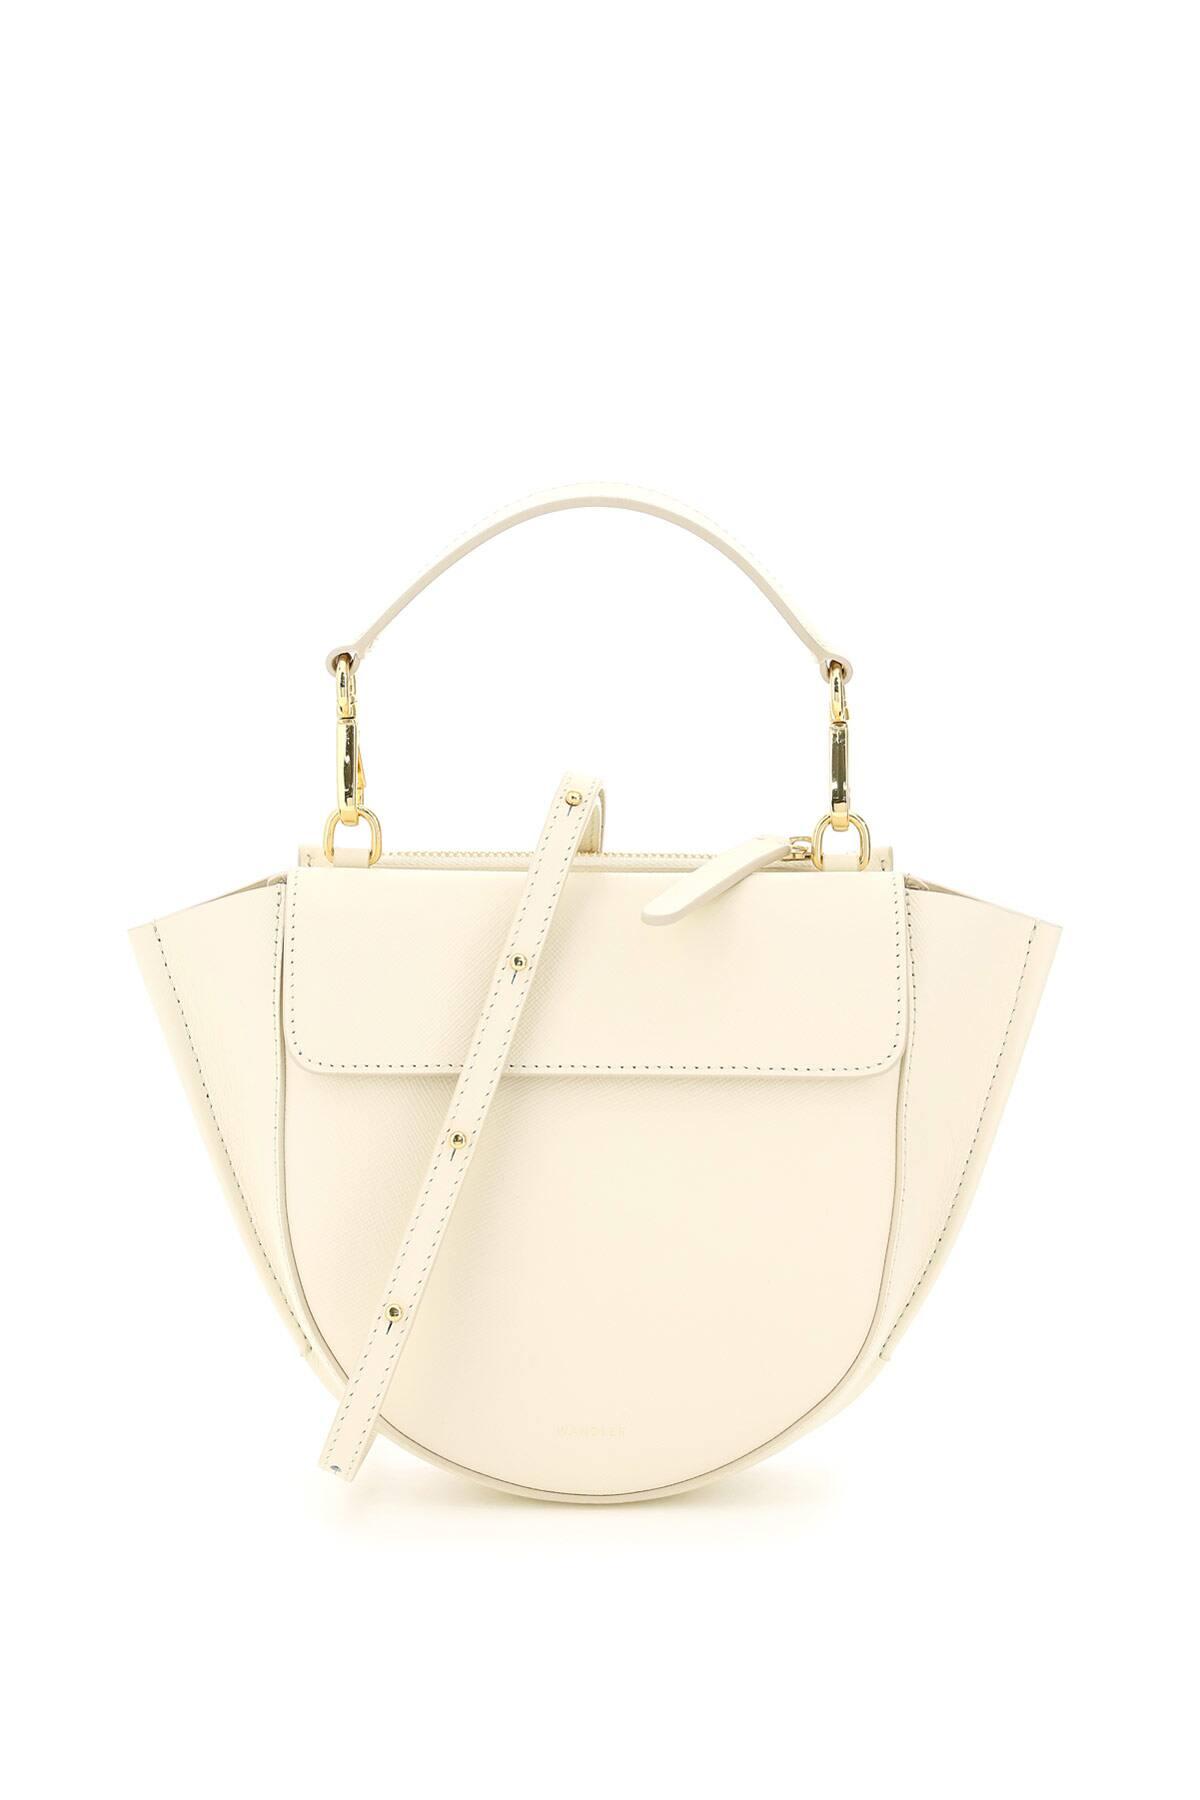 WANDLER MINI HORTENSIA SAFFIANO LEATHER BAG OS White, Beige Leather